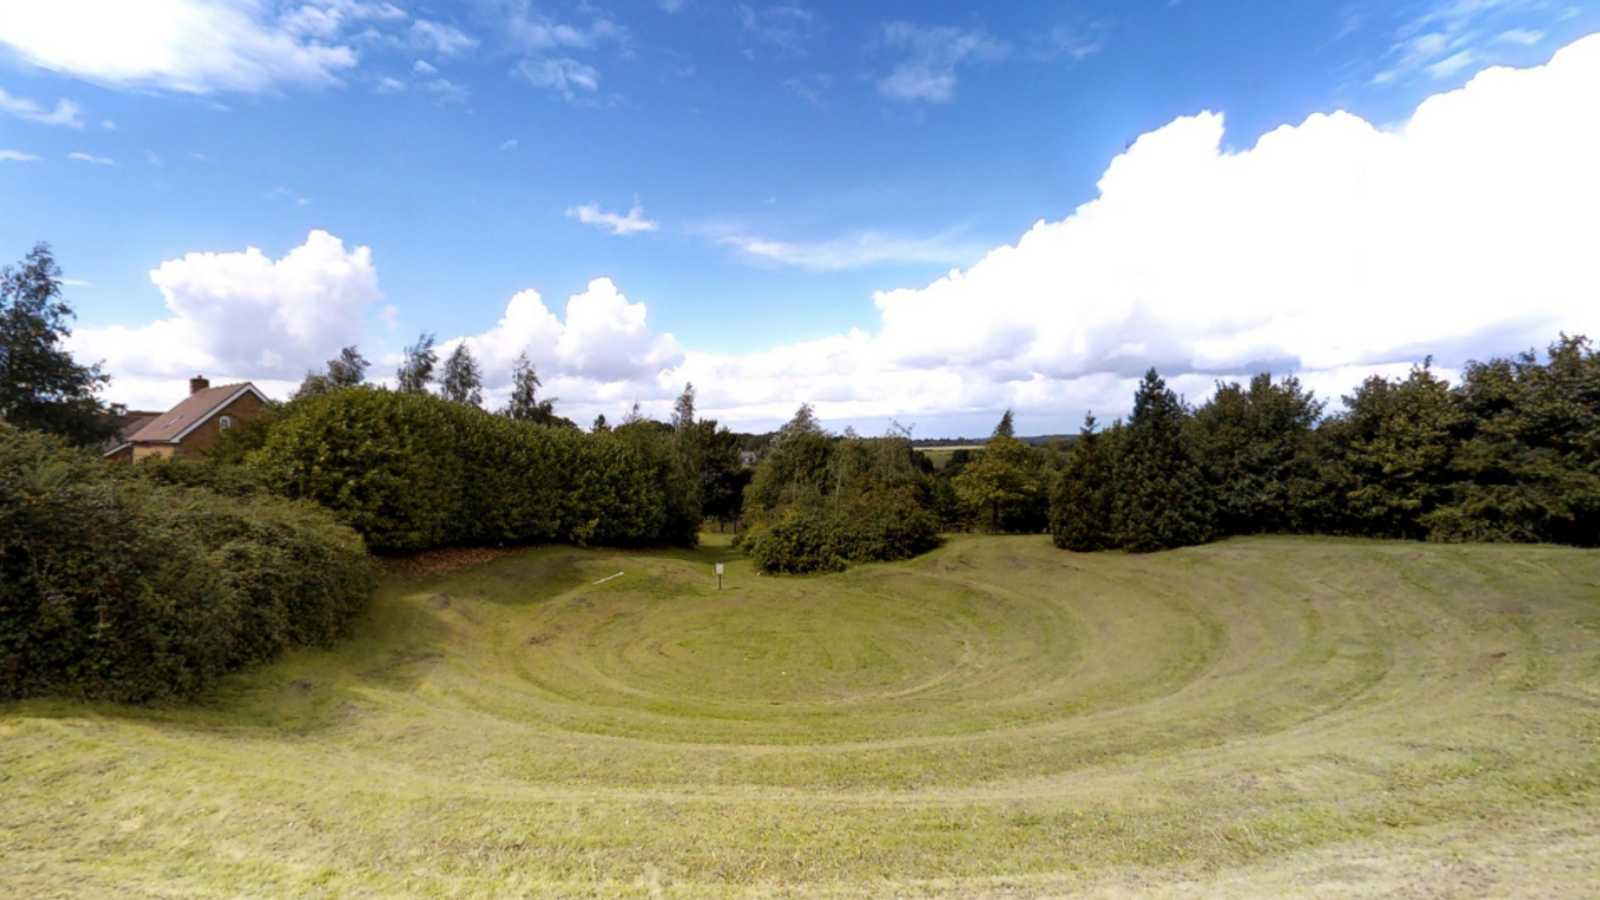 Outdoor grass ampitheatre